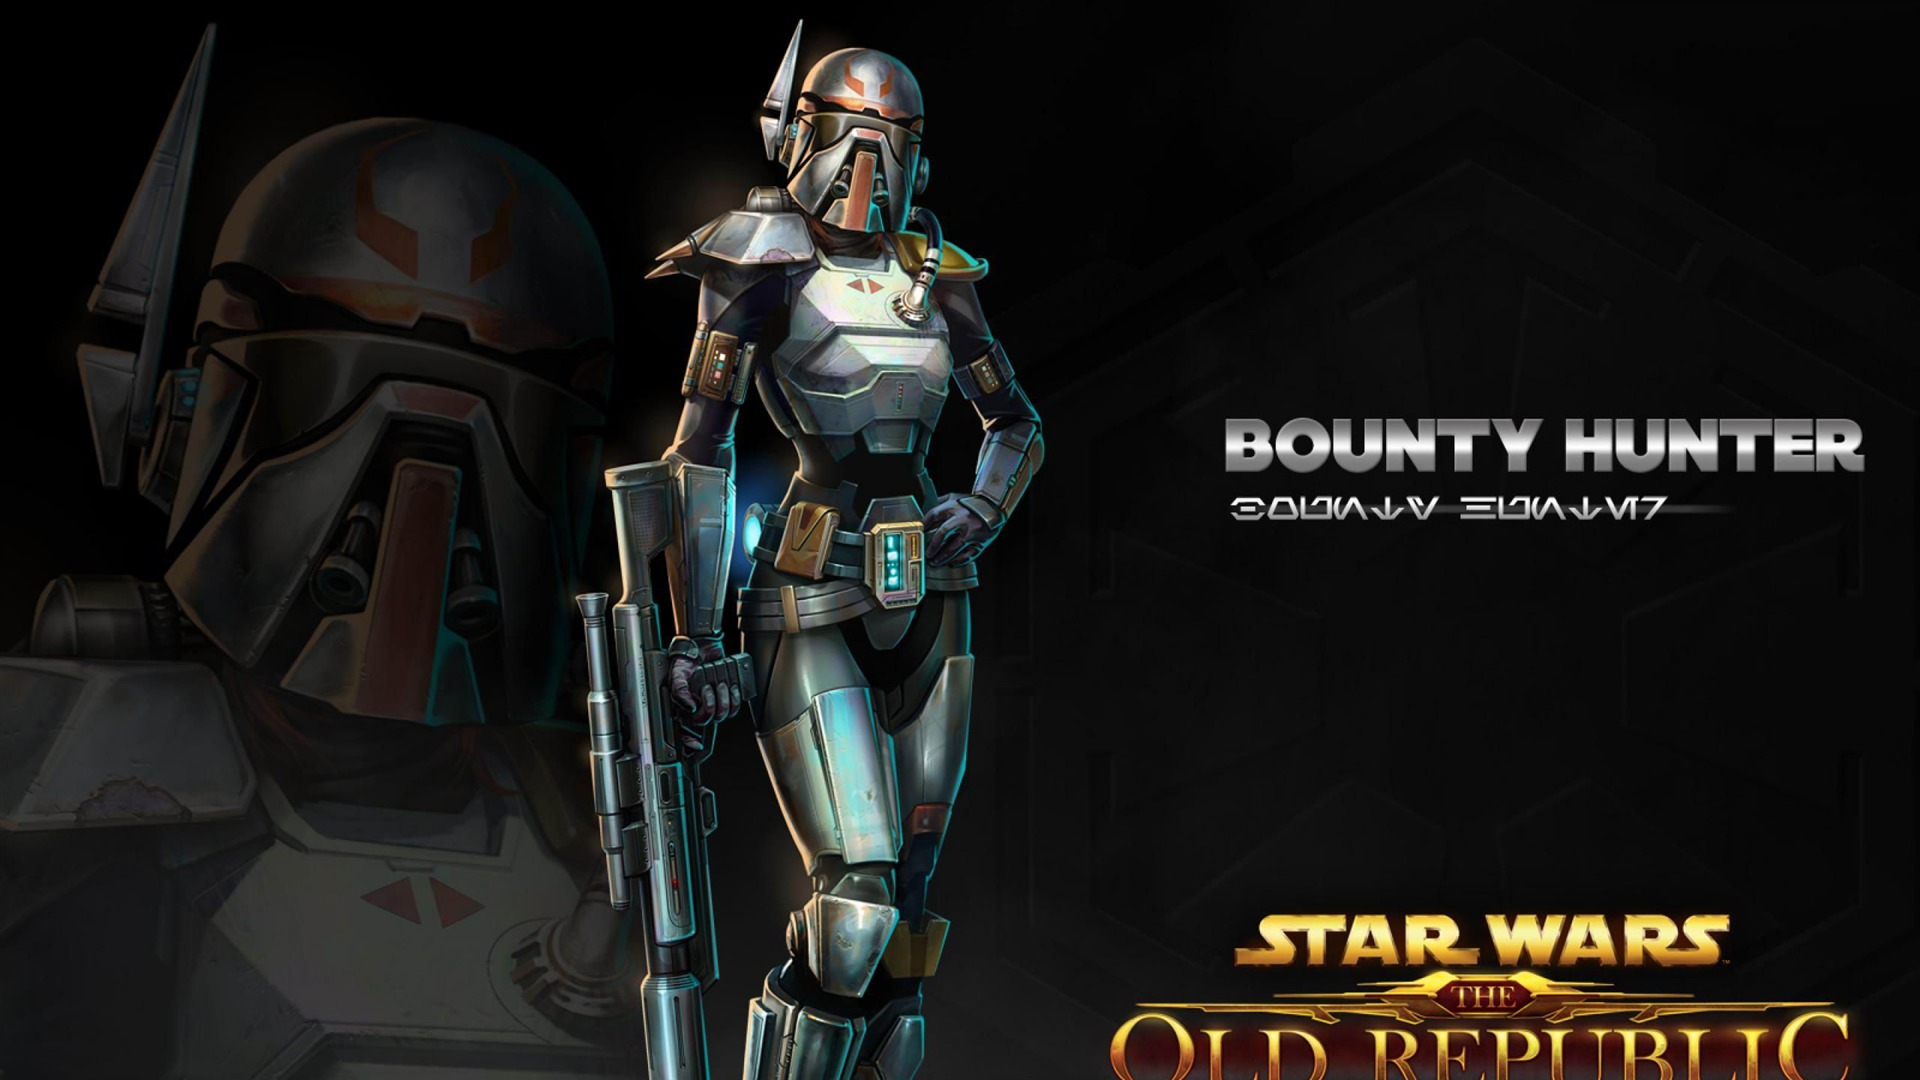 Bounty Hunter スターウォーズ旧共和国ゲームのhdの壁紙プレビュー 10wallpaper Com